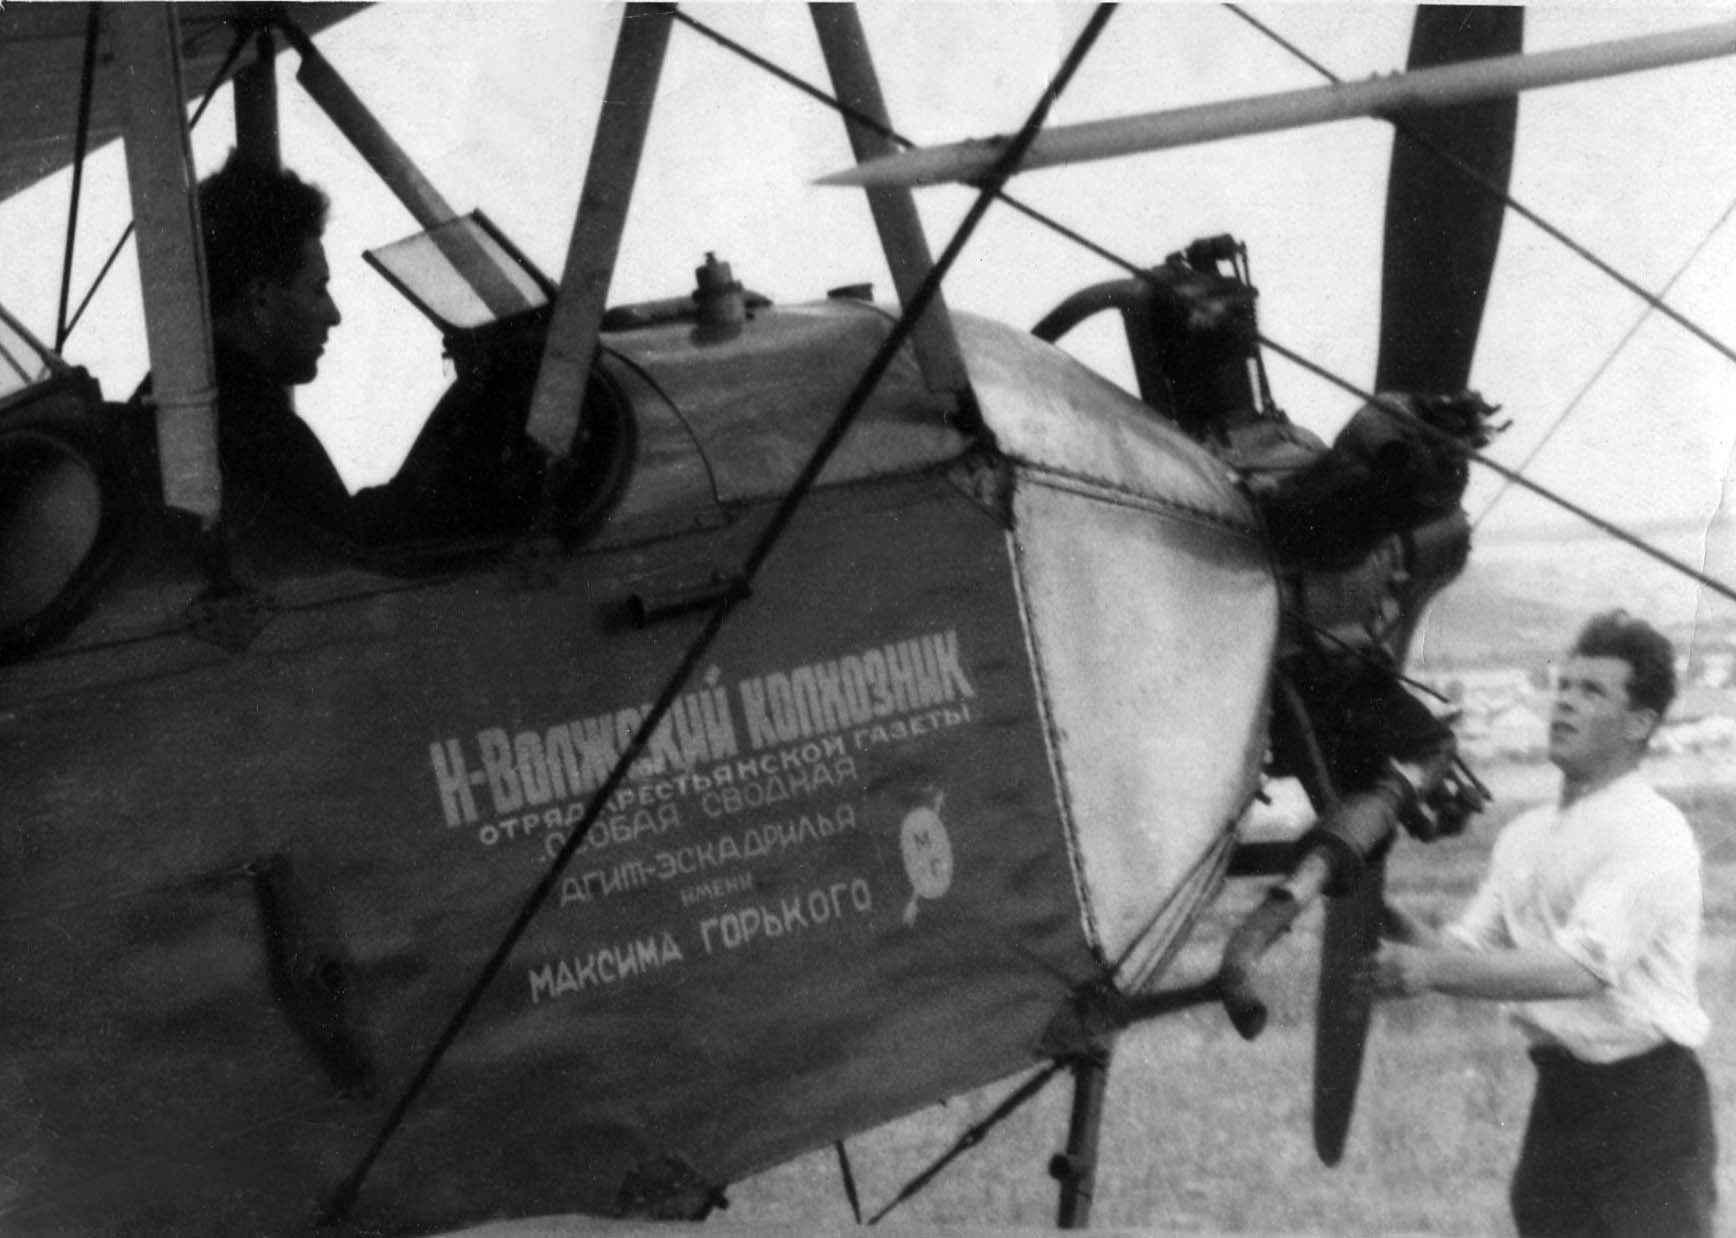 Экспонат #11. Биплан У-2 агитэскадрильи им. Максима Горького. 30-е годы